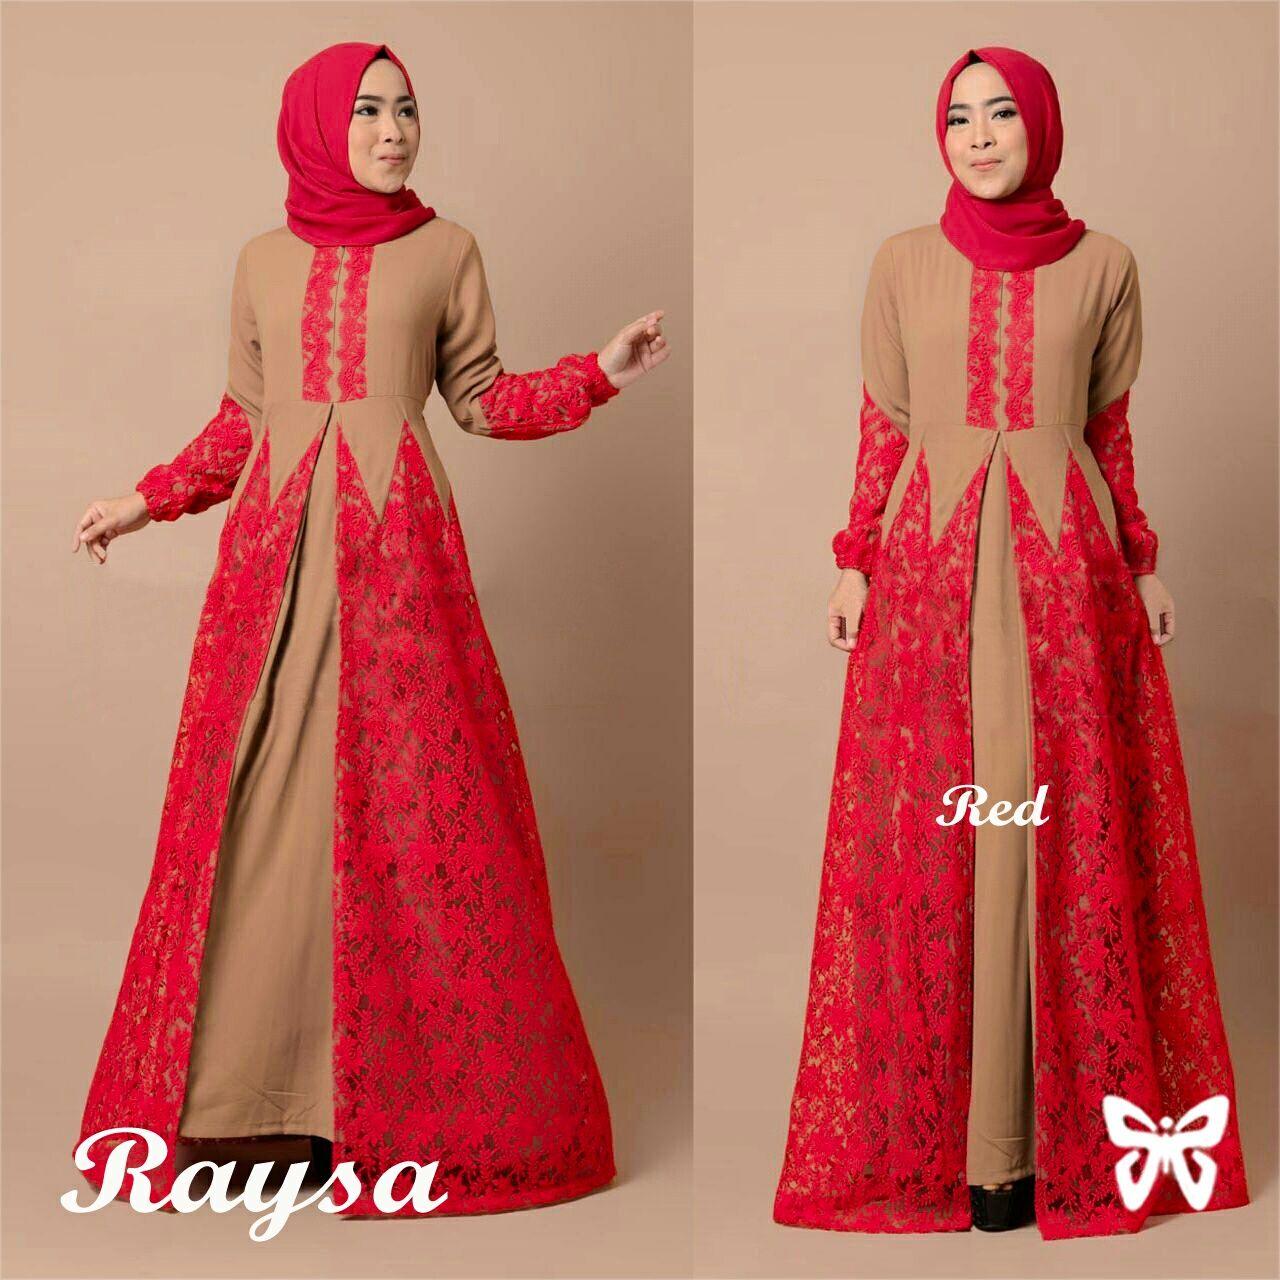 Pin By Indah Srie On Baju Muslim Batik Kombinasi Pinterest Batik